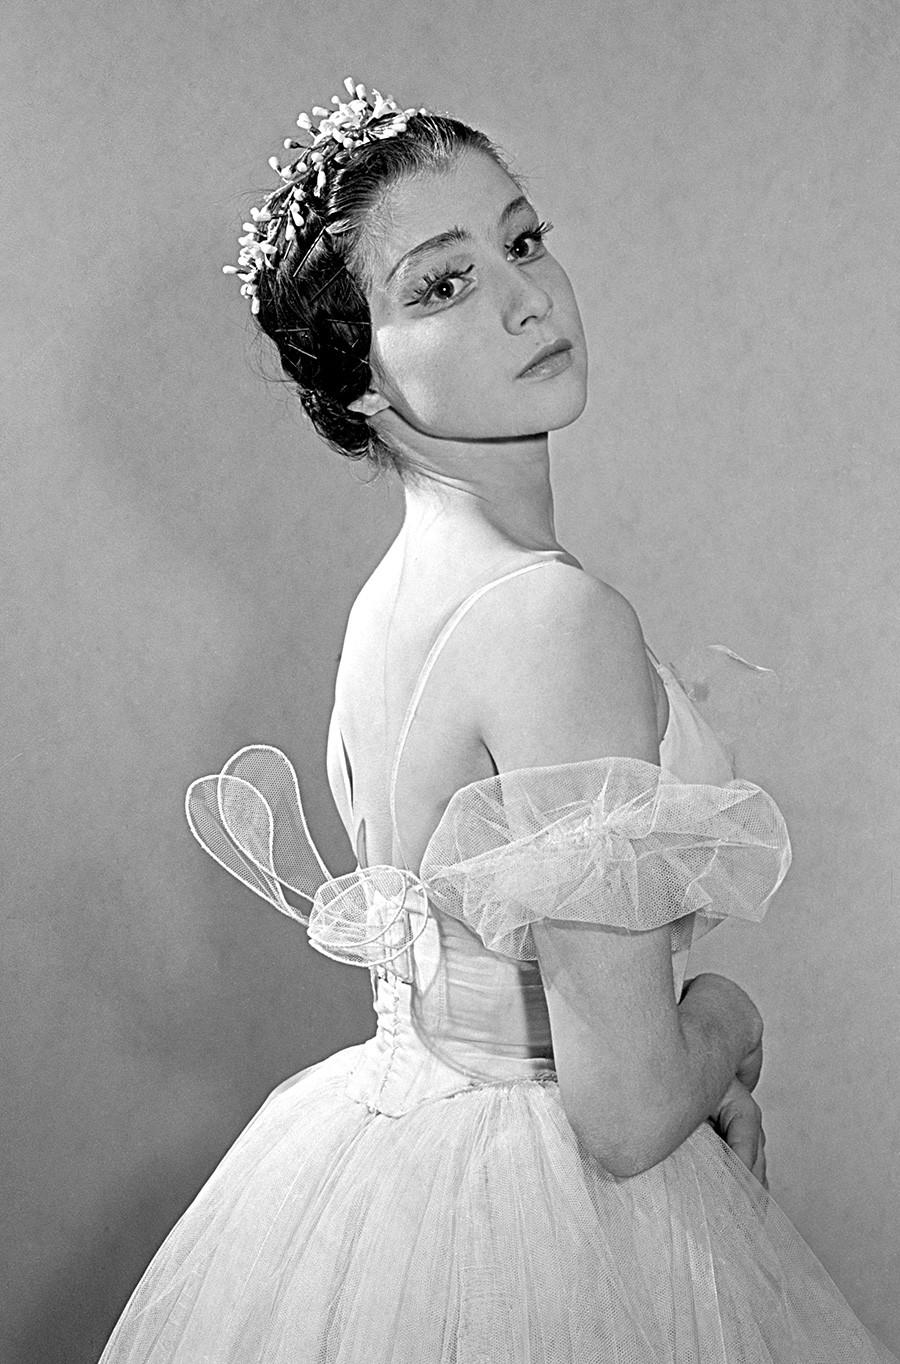 Ekaterina Maksimova, 1961